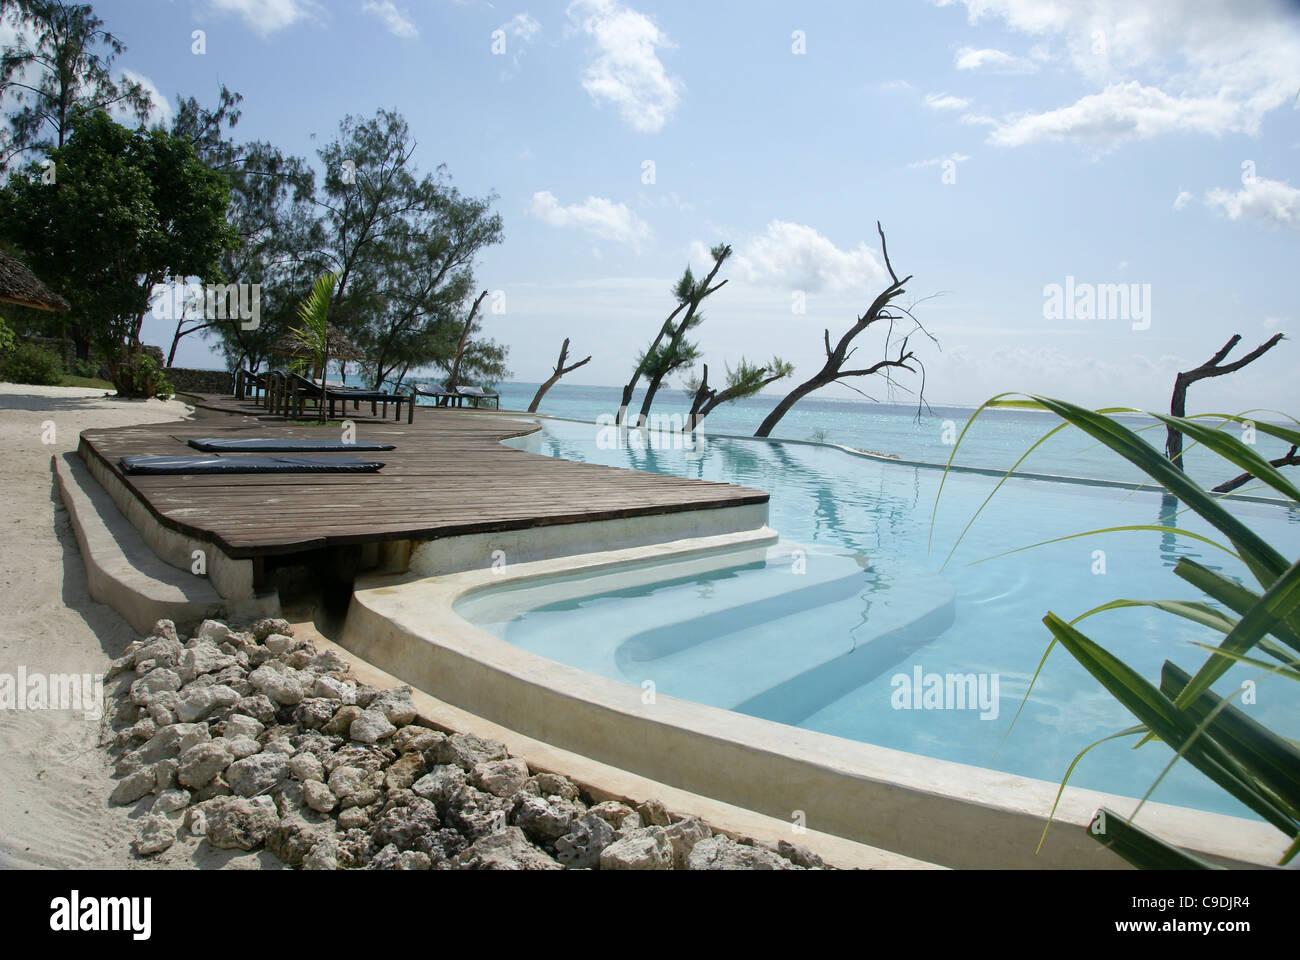 Tanzania, Zanzibar, Pongwe Beach Hotel on Unguja Island - Stock Image